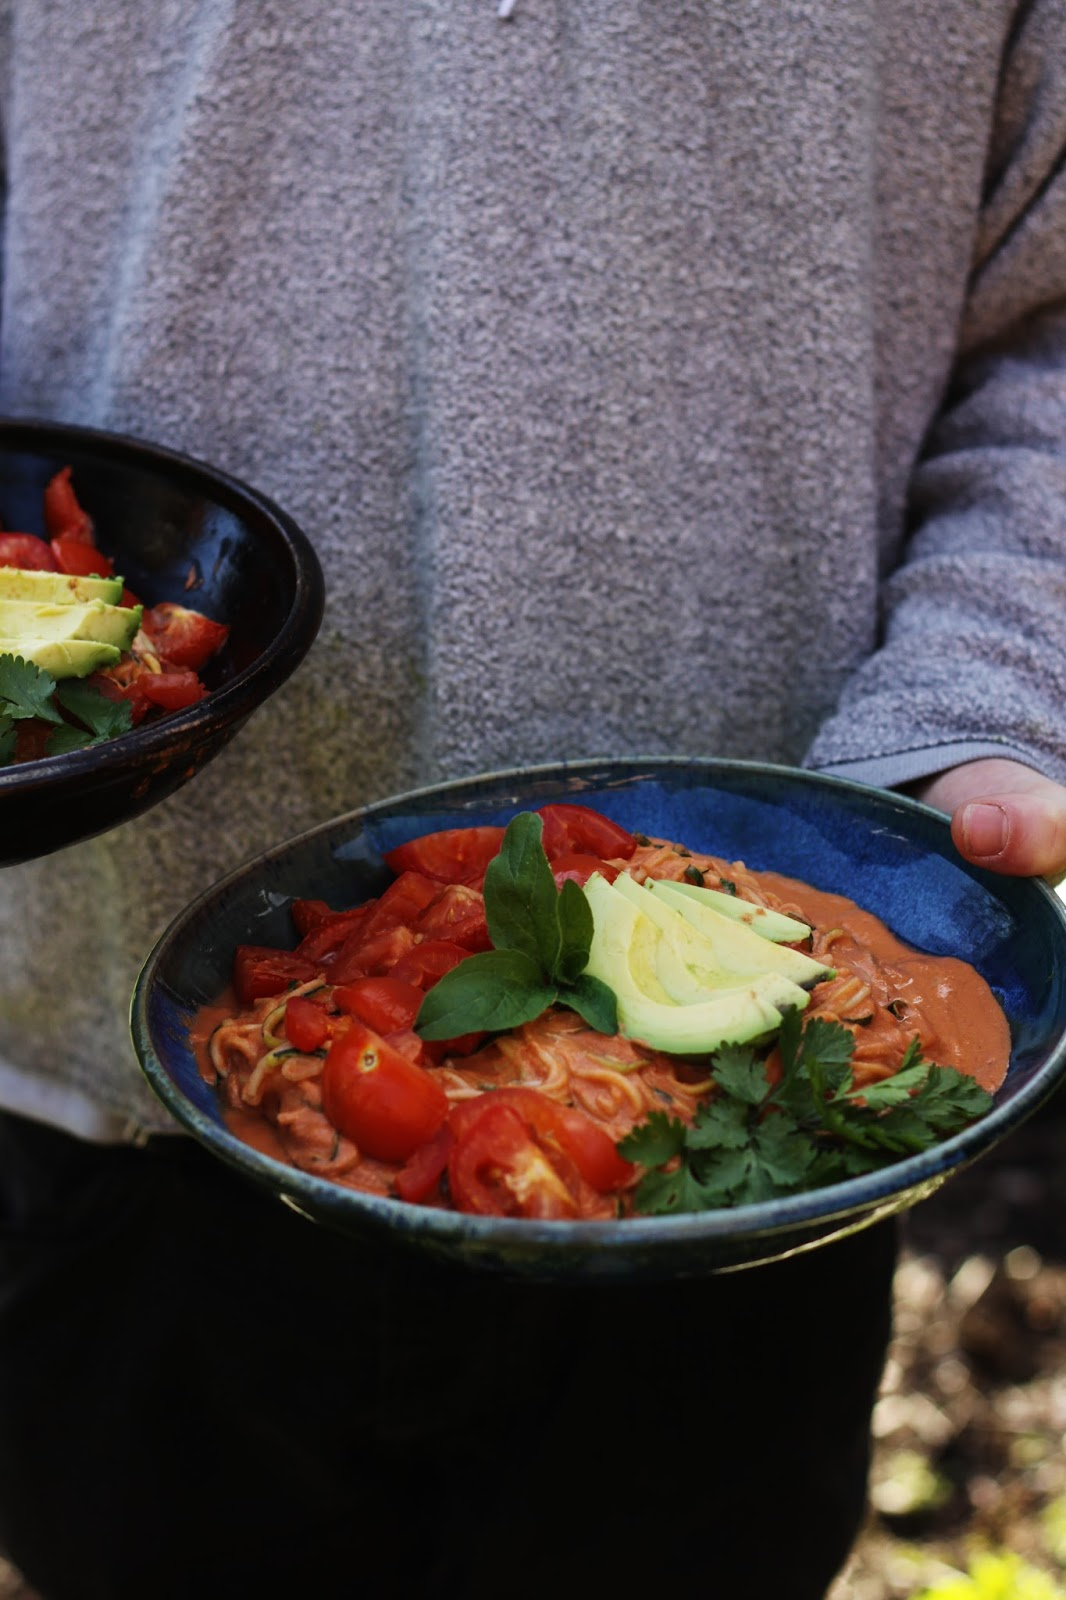 ... Vegan Life: ZUCCHINI SPAGHETTI + TOMATO GARLIC SAUCE with FRESH HERBS